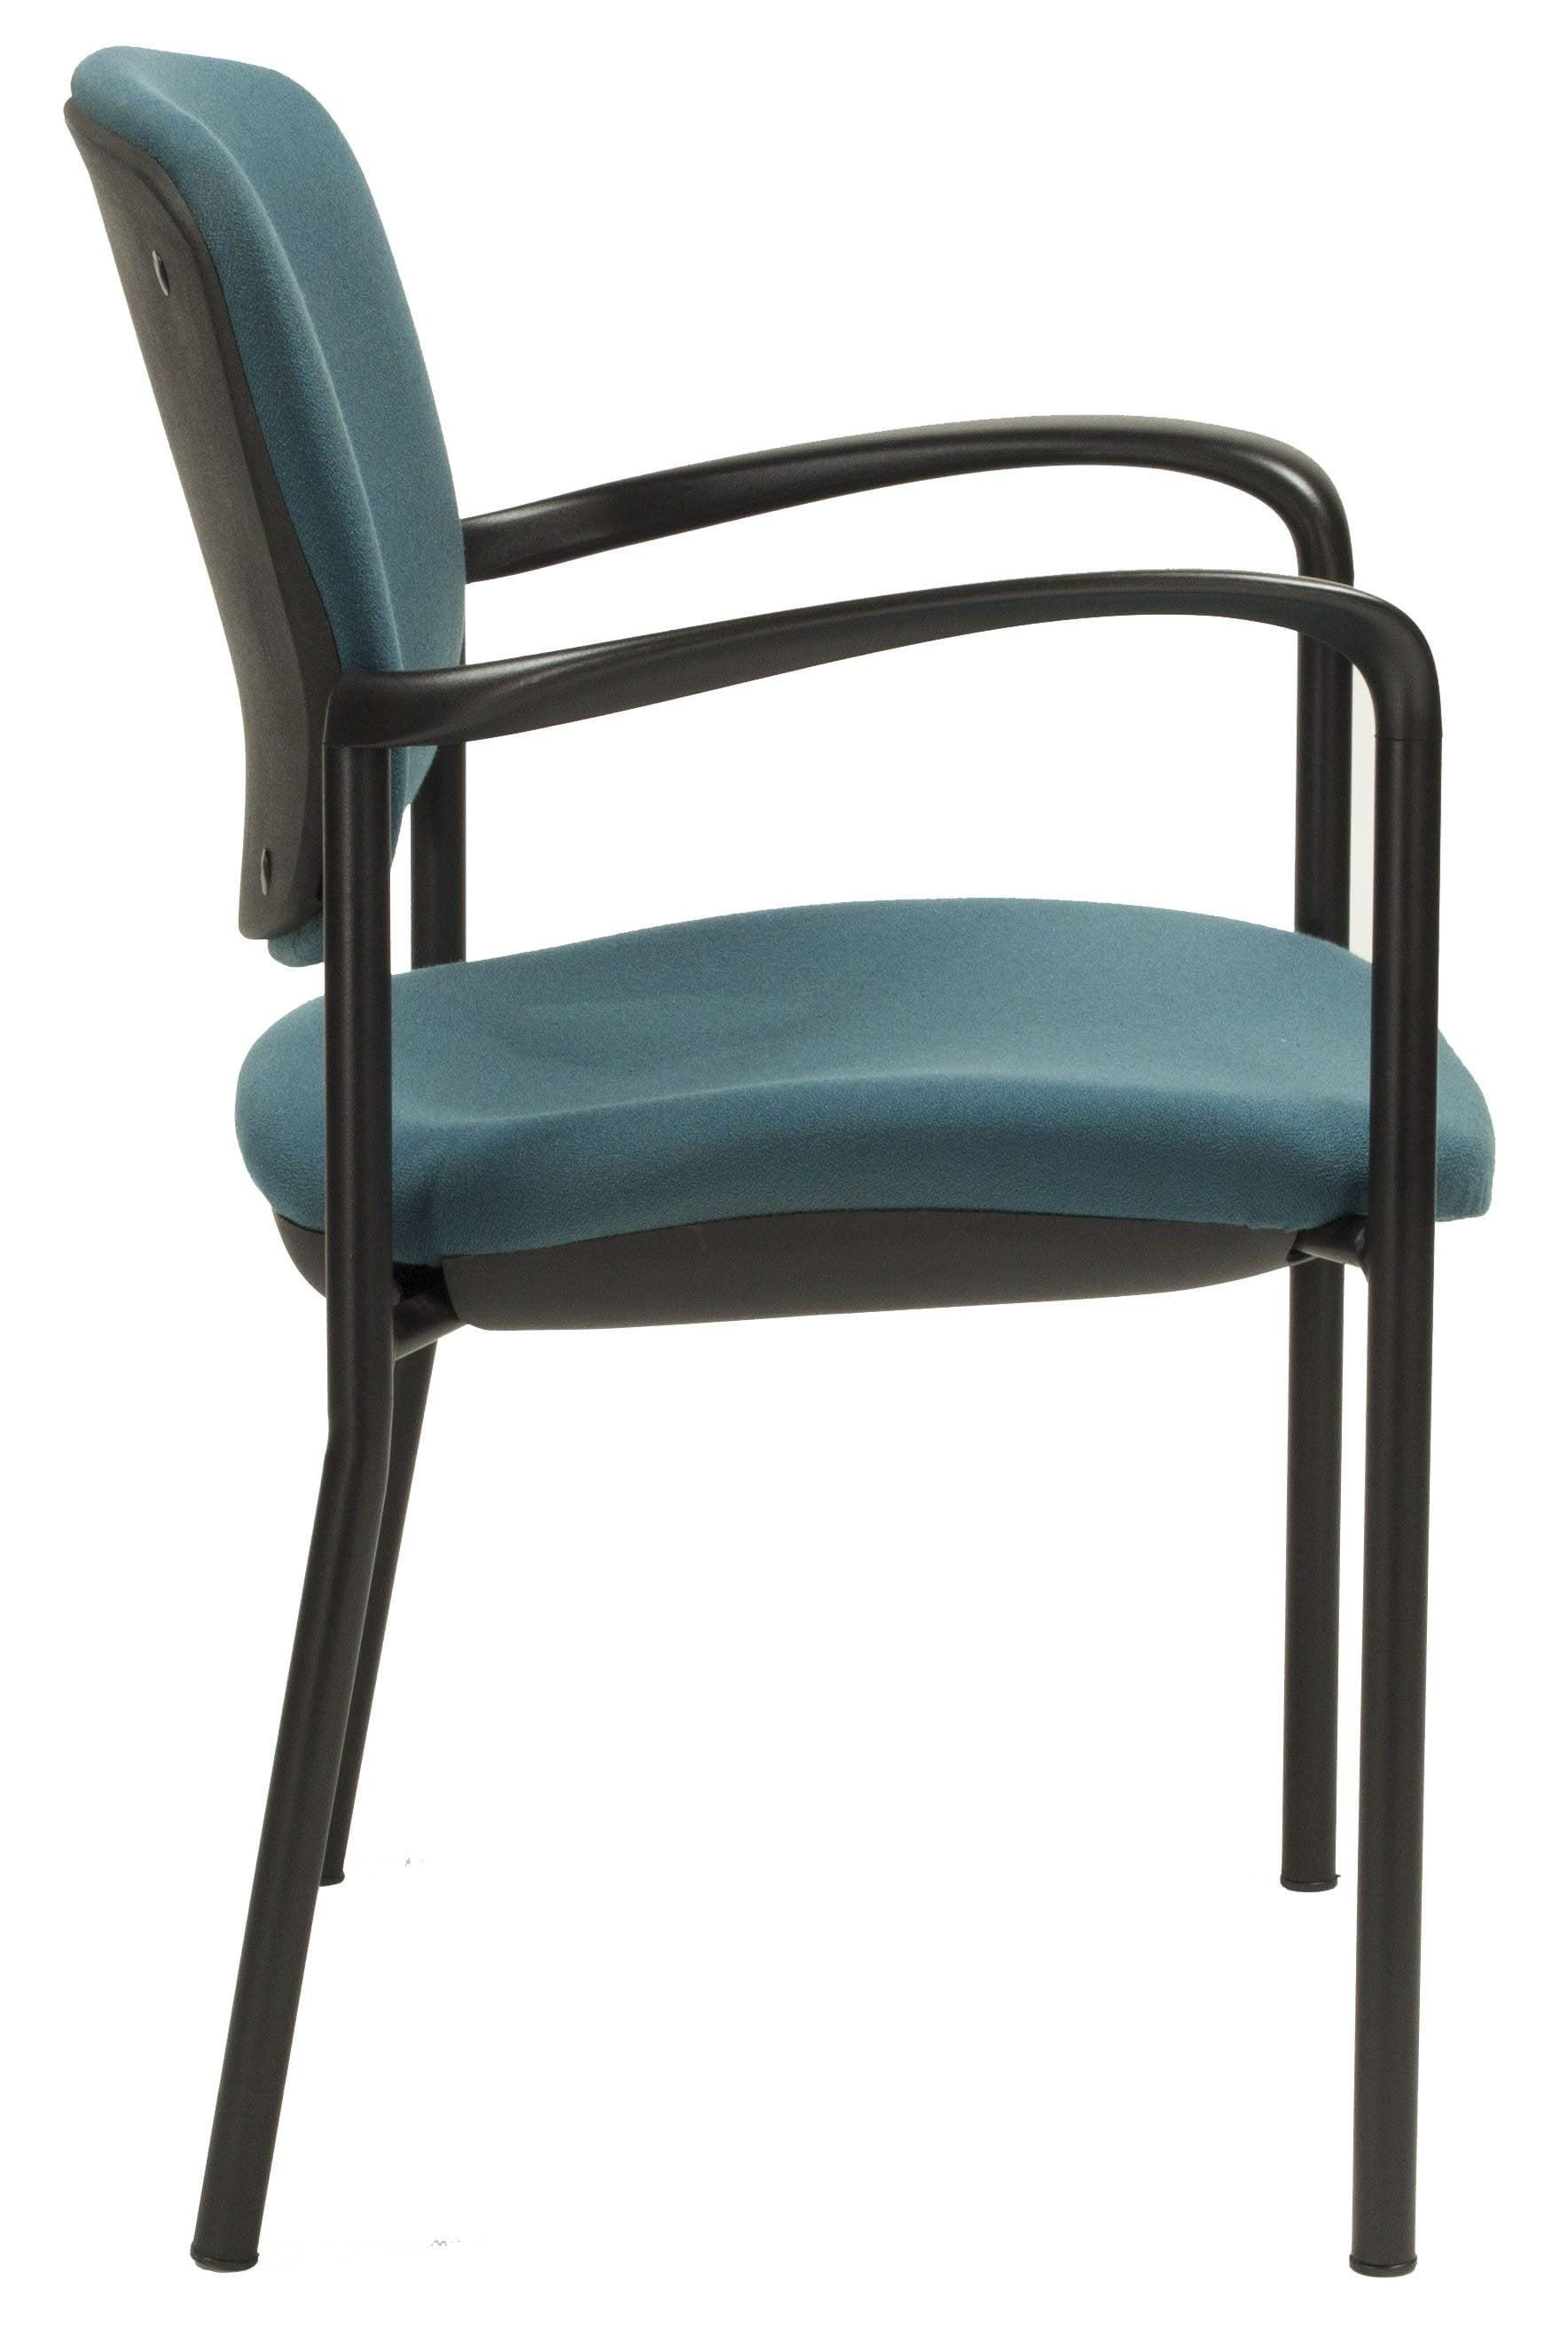 Haworth Improv Used Stack Chair Dark Teal National